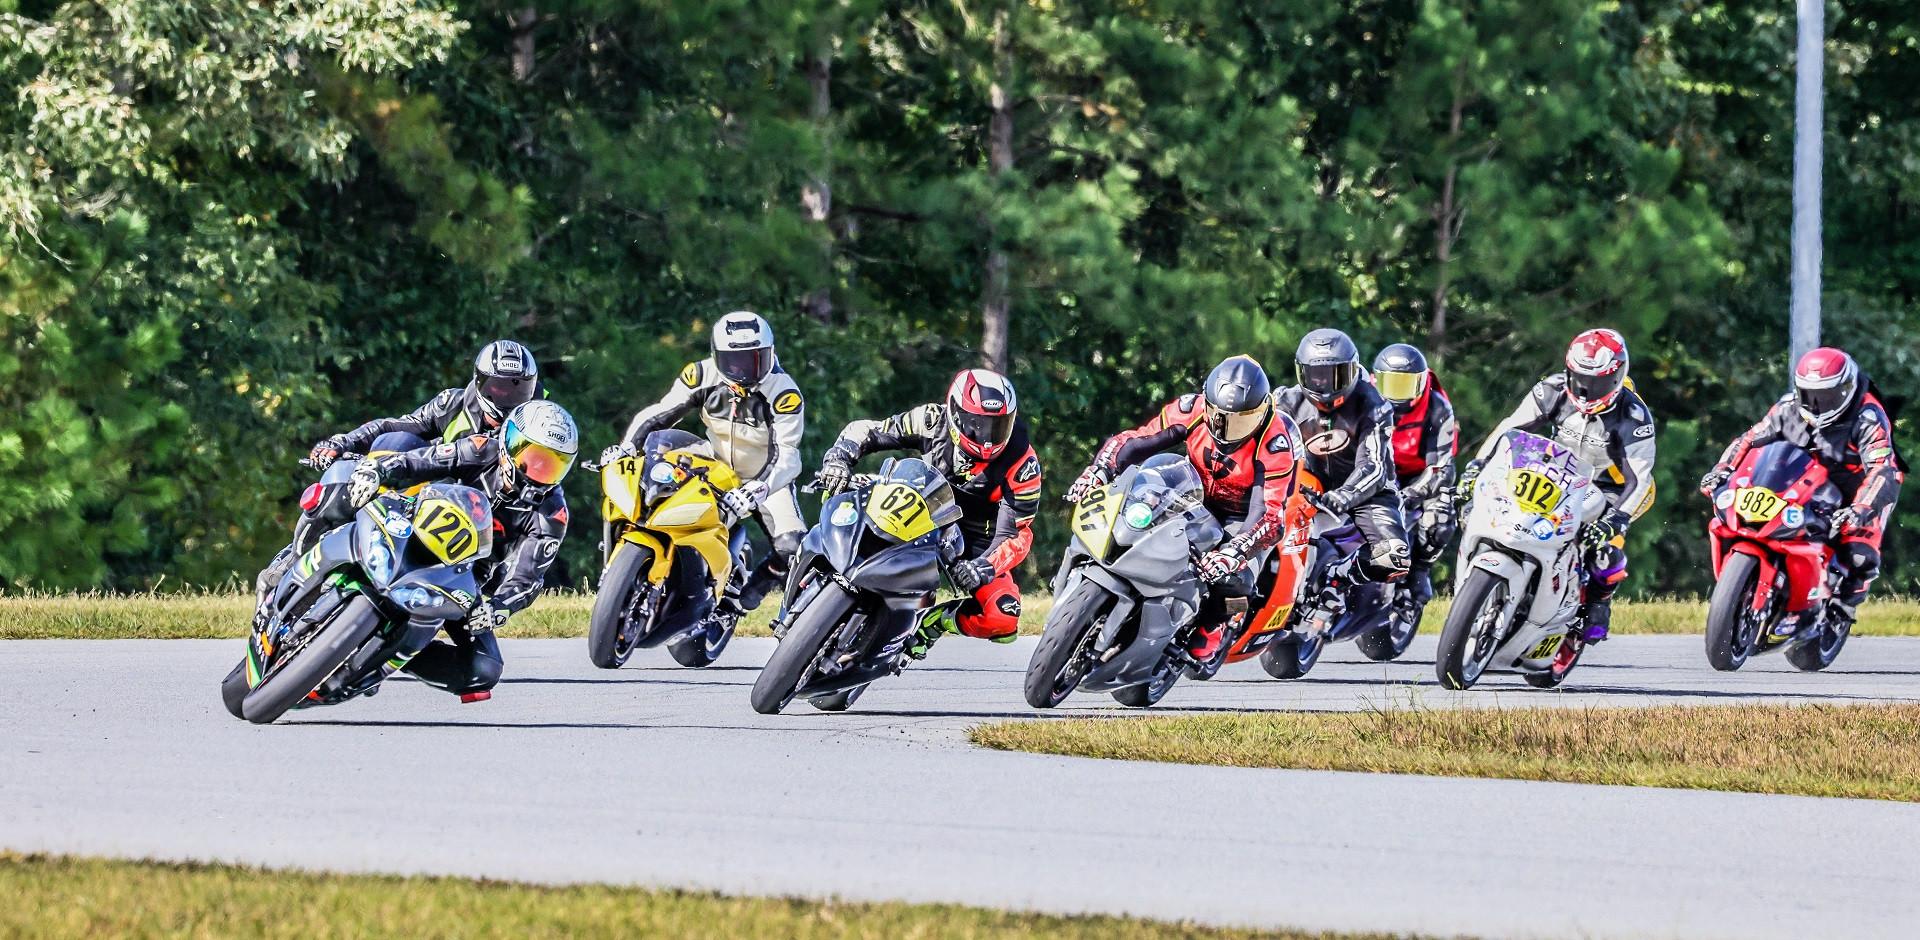 The start of the Motogladiator Supersport 600 race at NC Bike. Photo by Joshua Barnett/Apex Pro Photo, courtesy of Motogladiator.